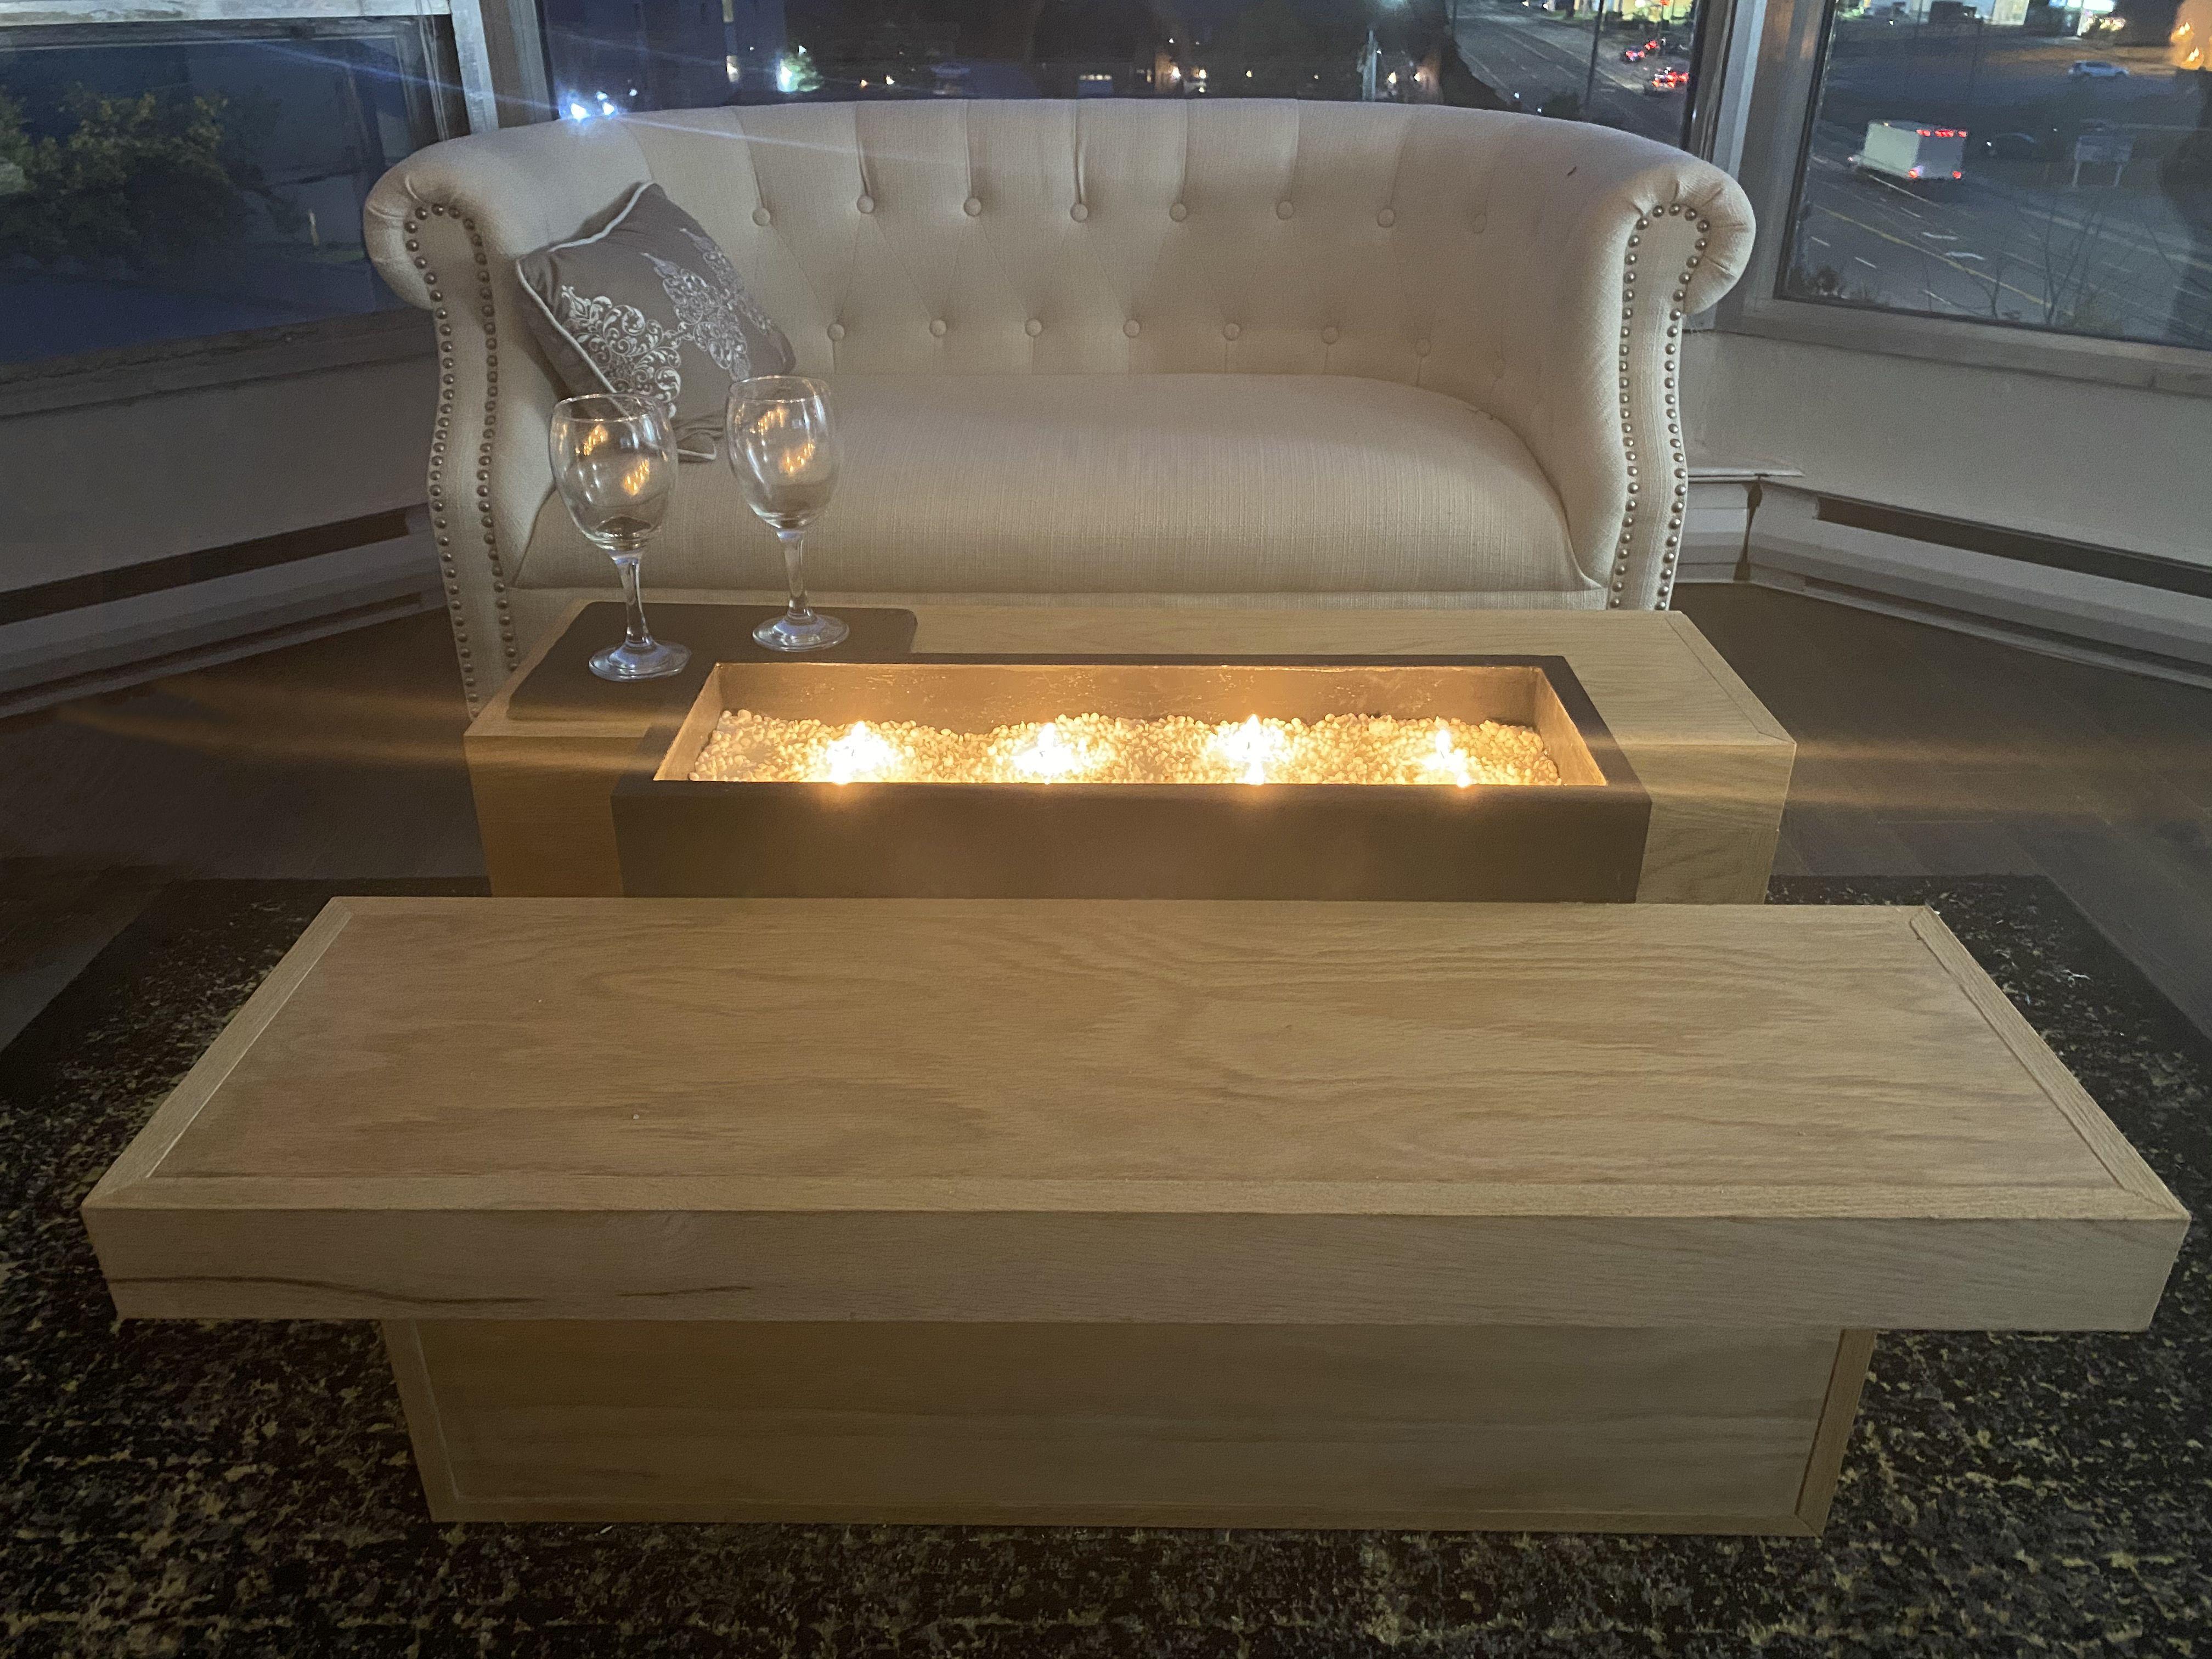 Modern Fire Pit Fireplace Coffee Table Coffee Table Fire Pit Coffee Table Coffee Table Fireplace [ 3024 x 4032 Pixel ]